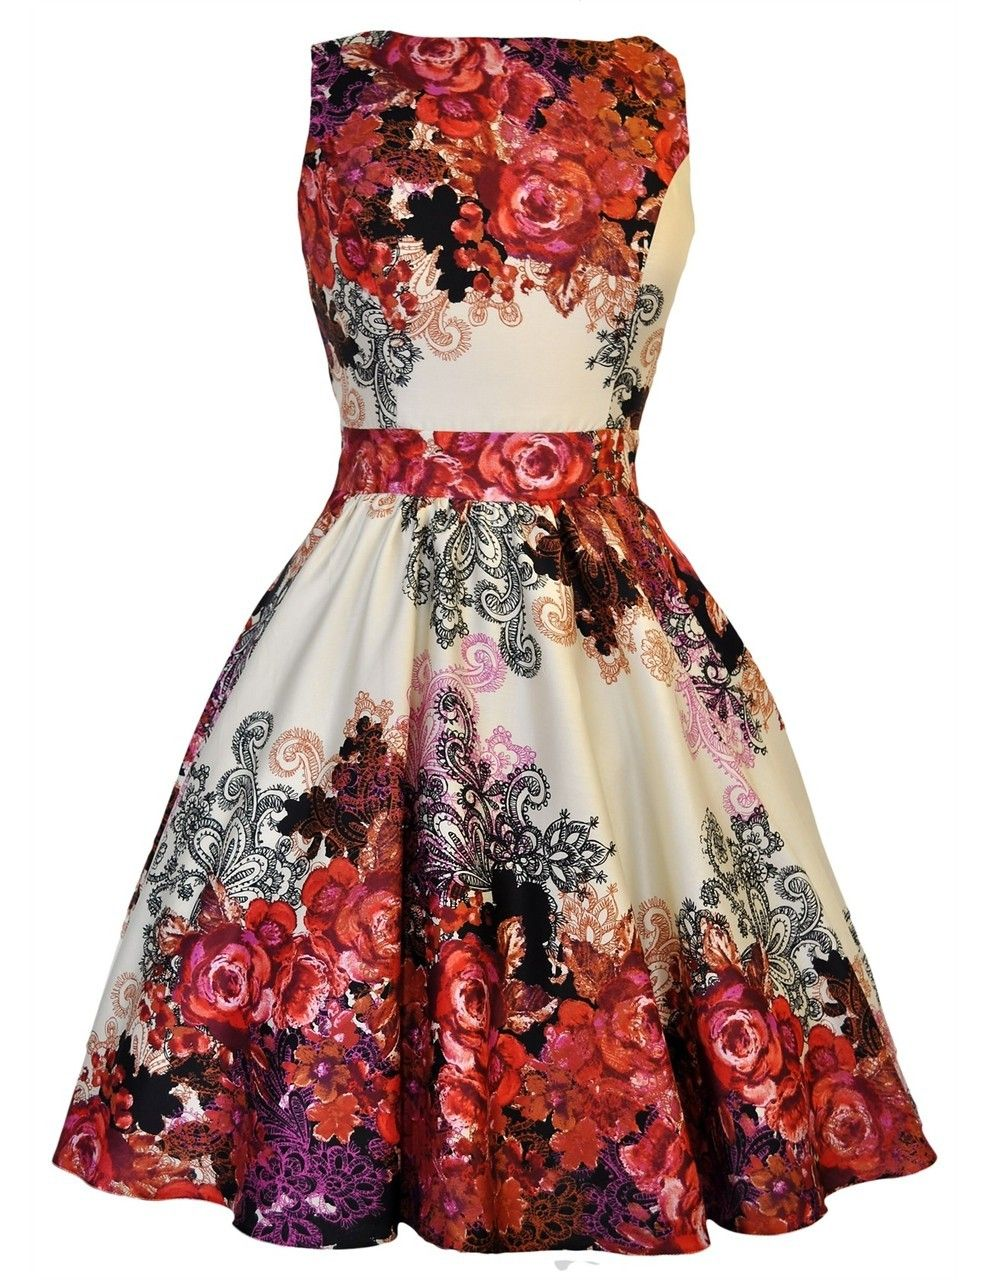 Pretty dress me gorgeous red rose tea dress badass